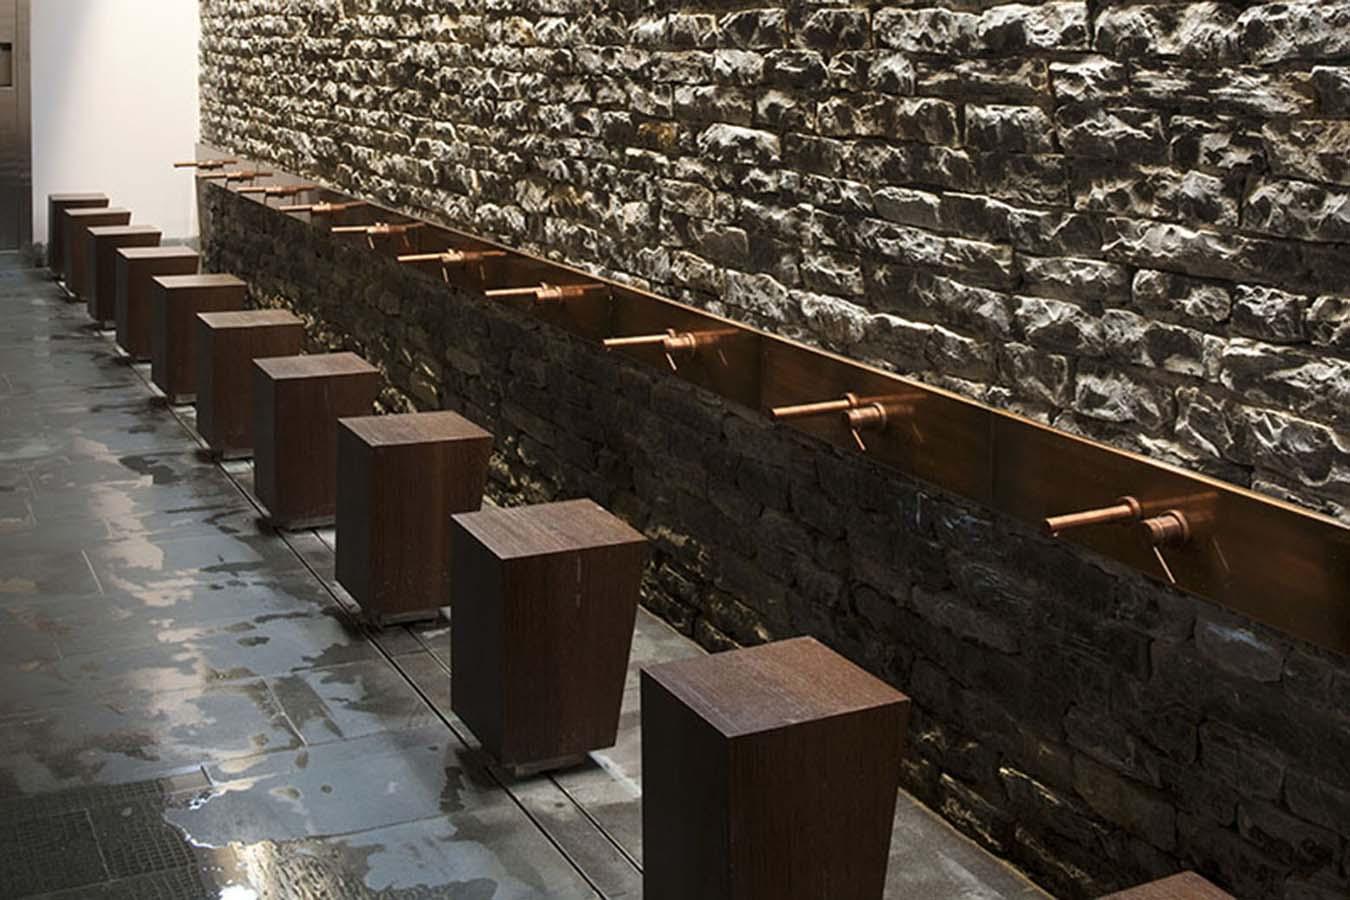 13-Emre-Arolat-Architects-Sancaklar-Mosque